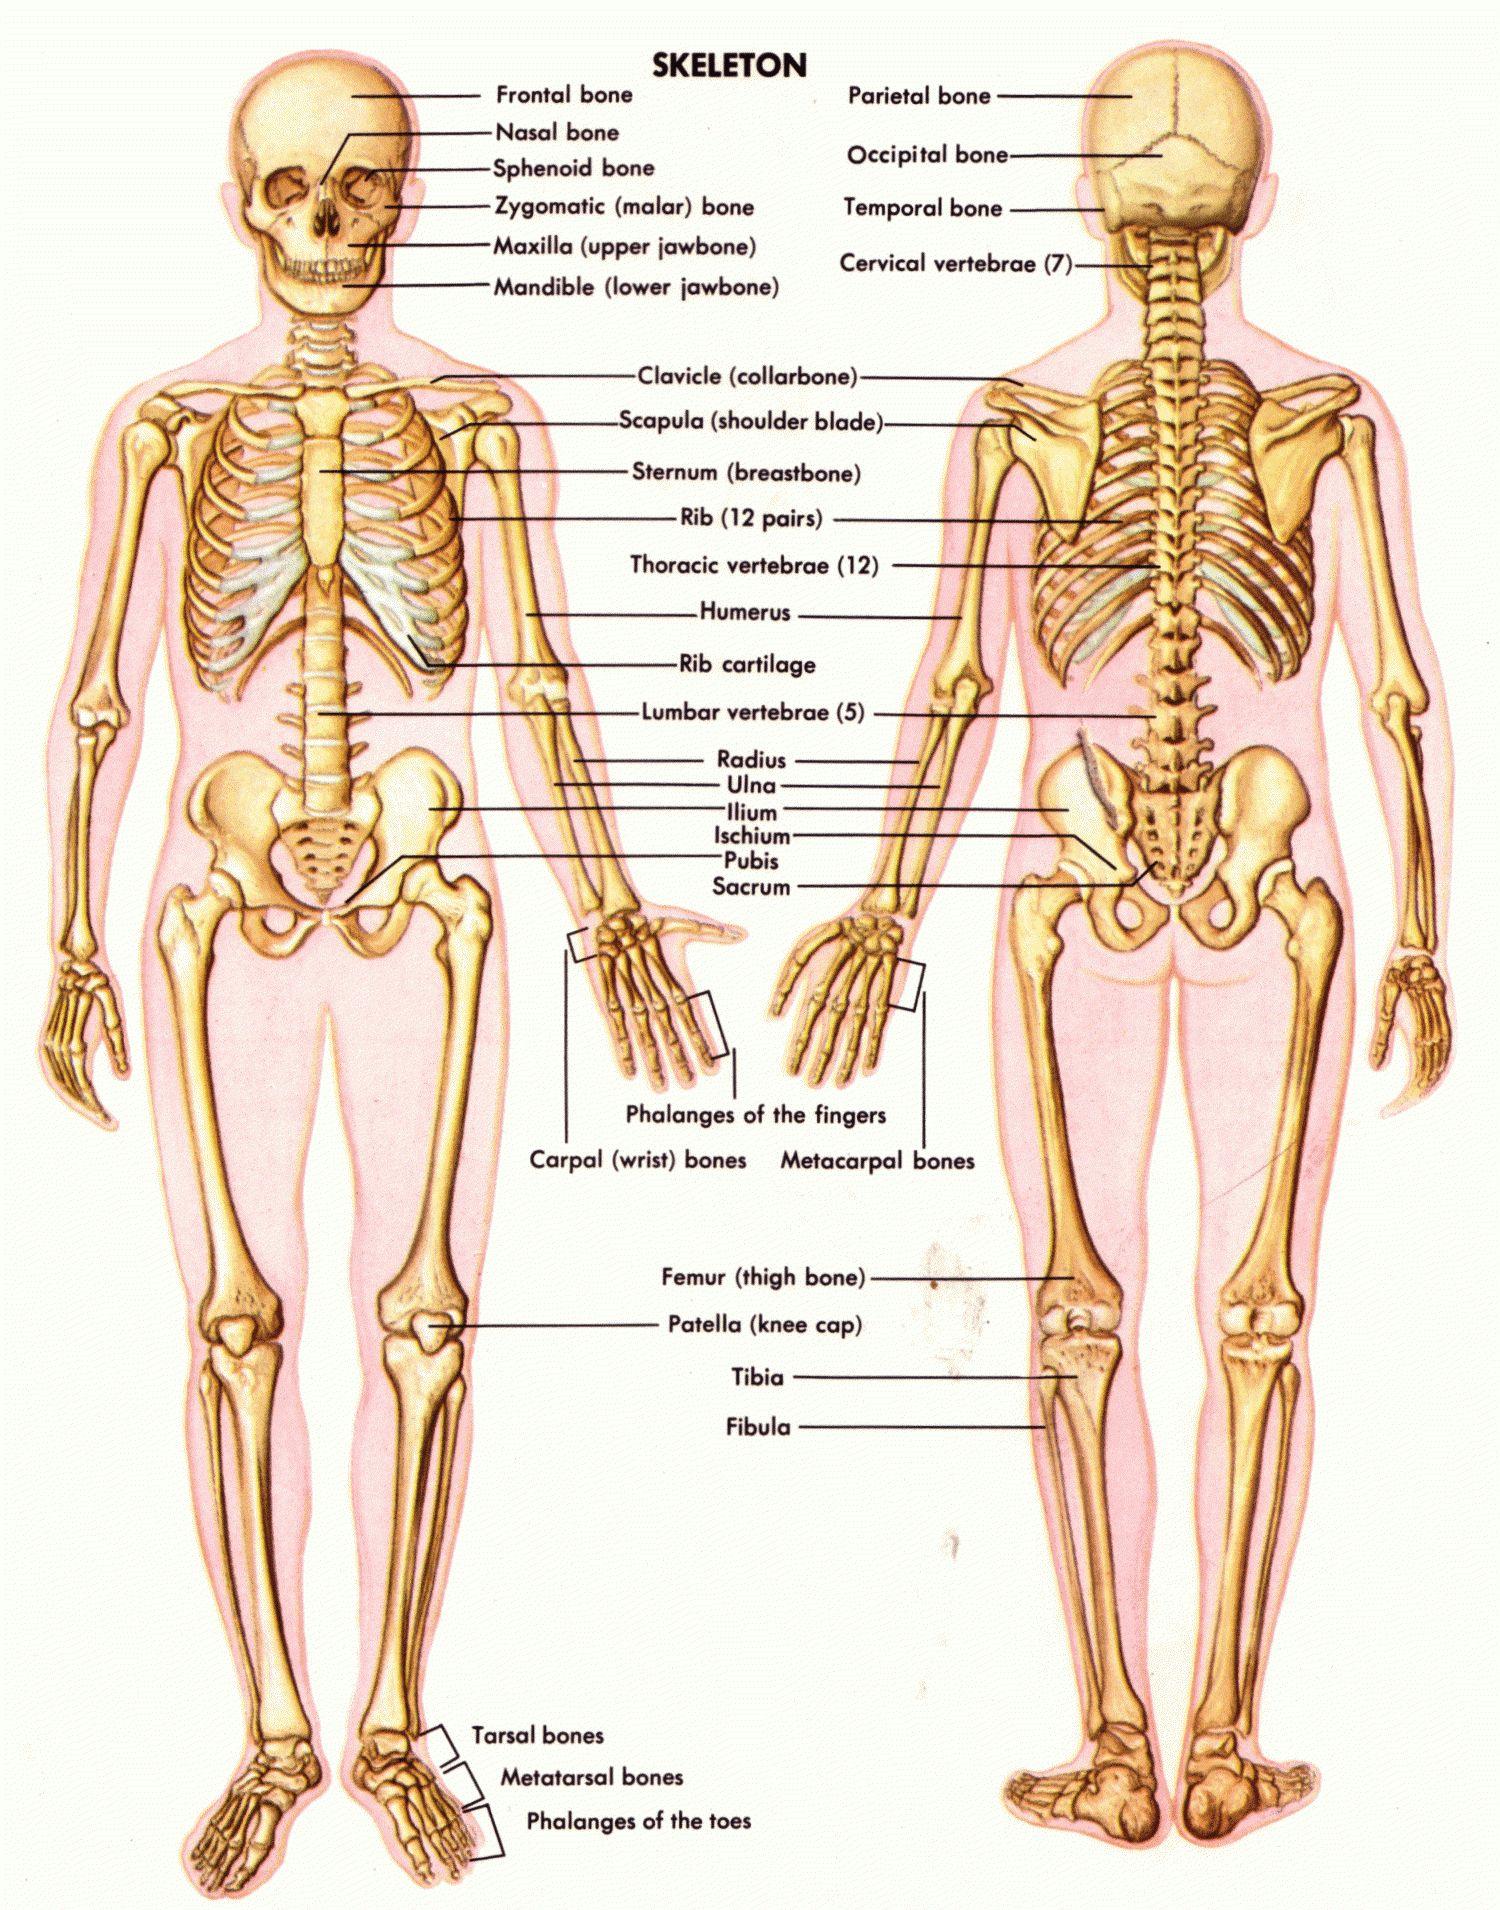 medium resolution of anatomy male groin anatomy male groin skeletal grion area male groin bones diagram